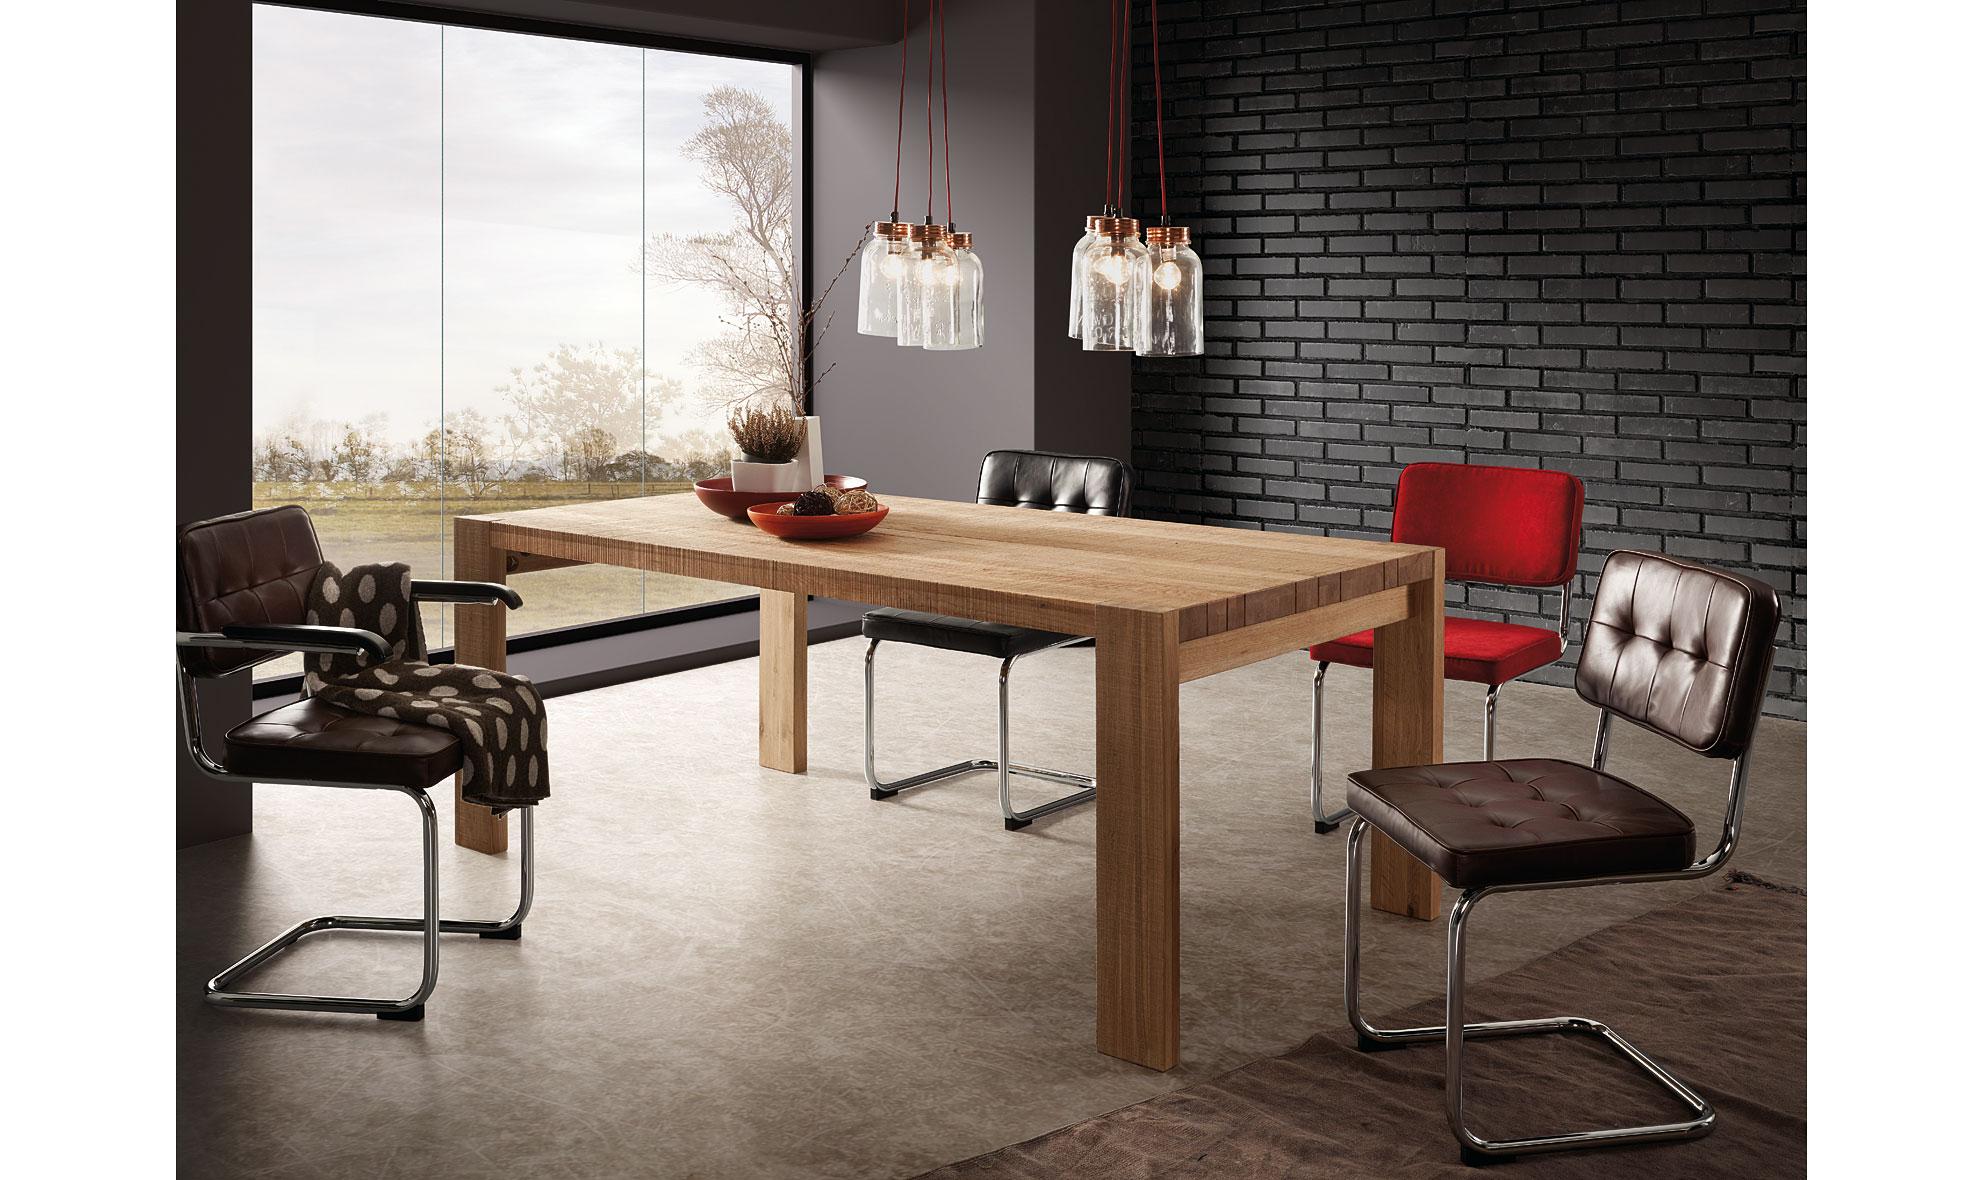 Mesa de comedor vintage jorg de lujo en portobellodeluxe for Tu muebles catalogo